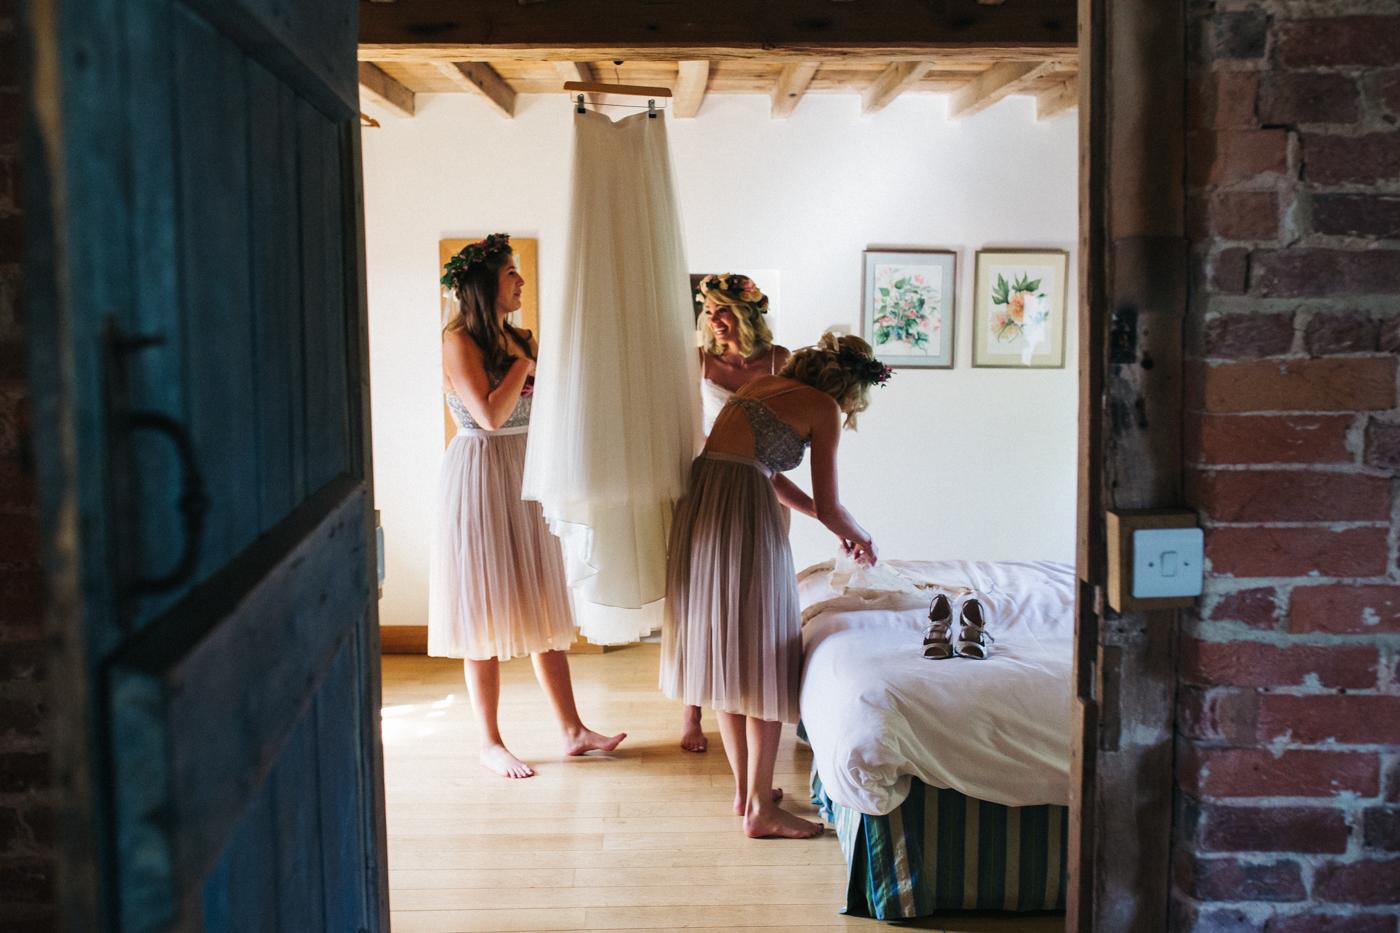 bentley-wildfowl-motor-museum-wedding-photographer-lewes-brighton-east-sussex-0008.jpg